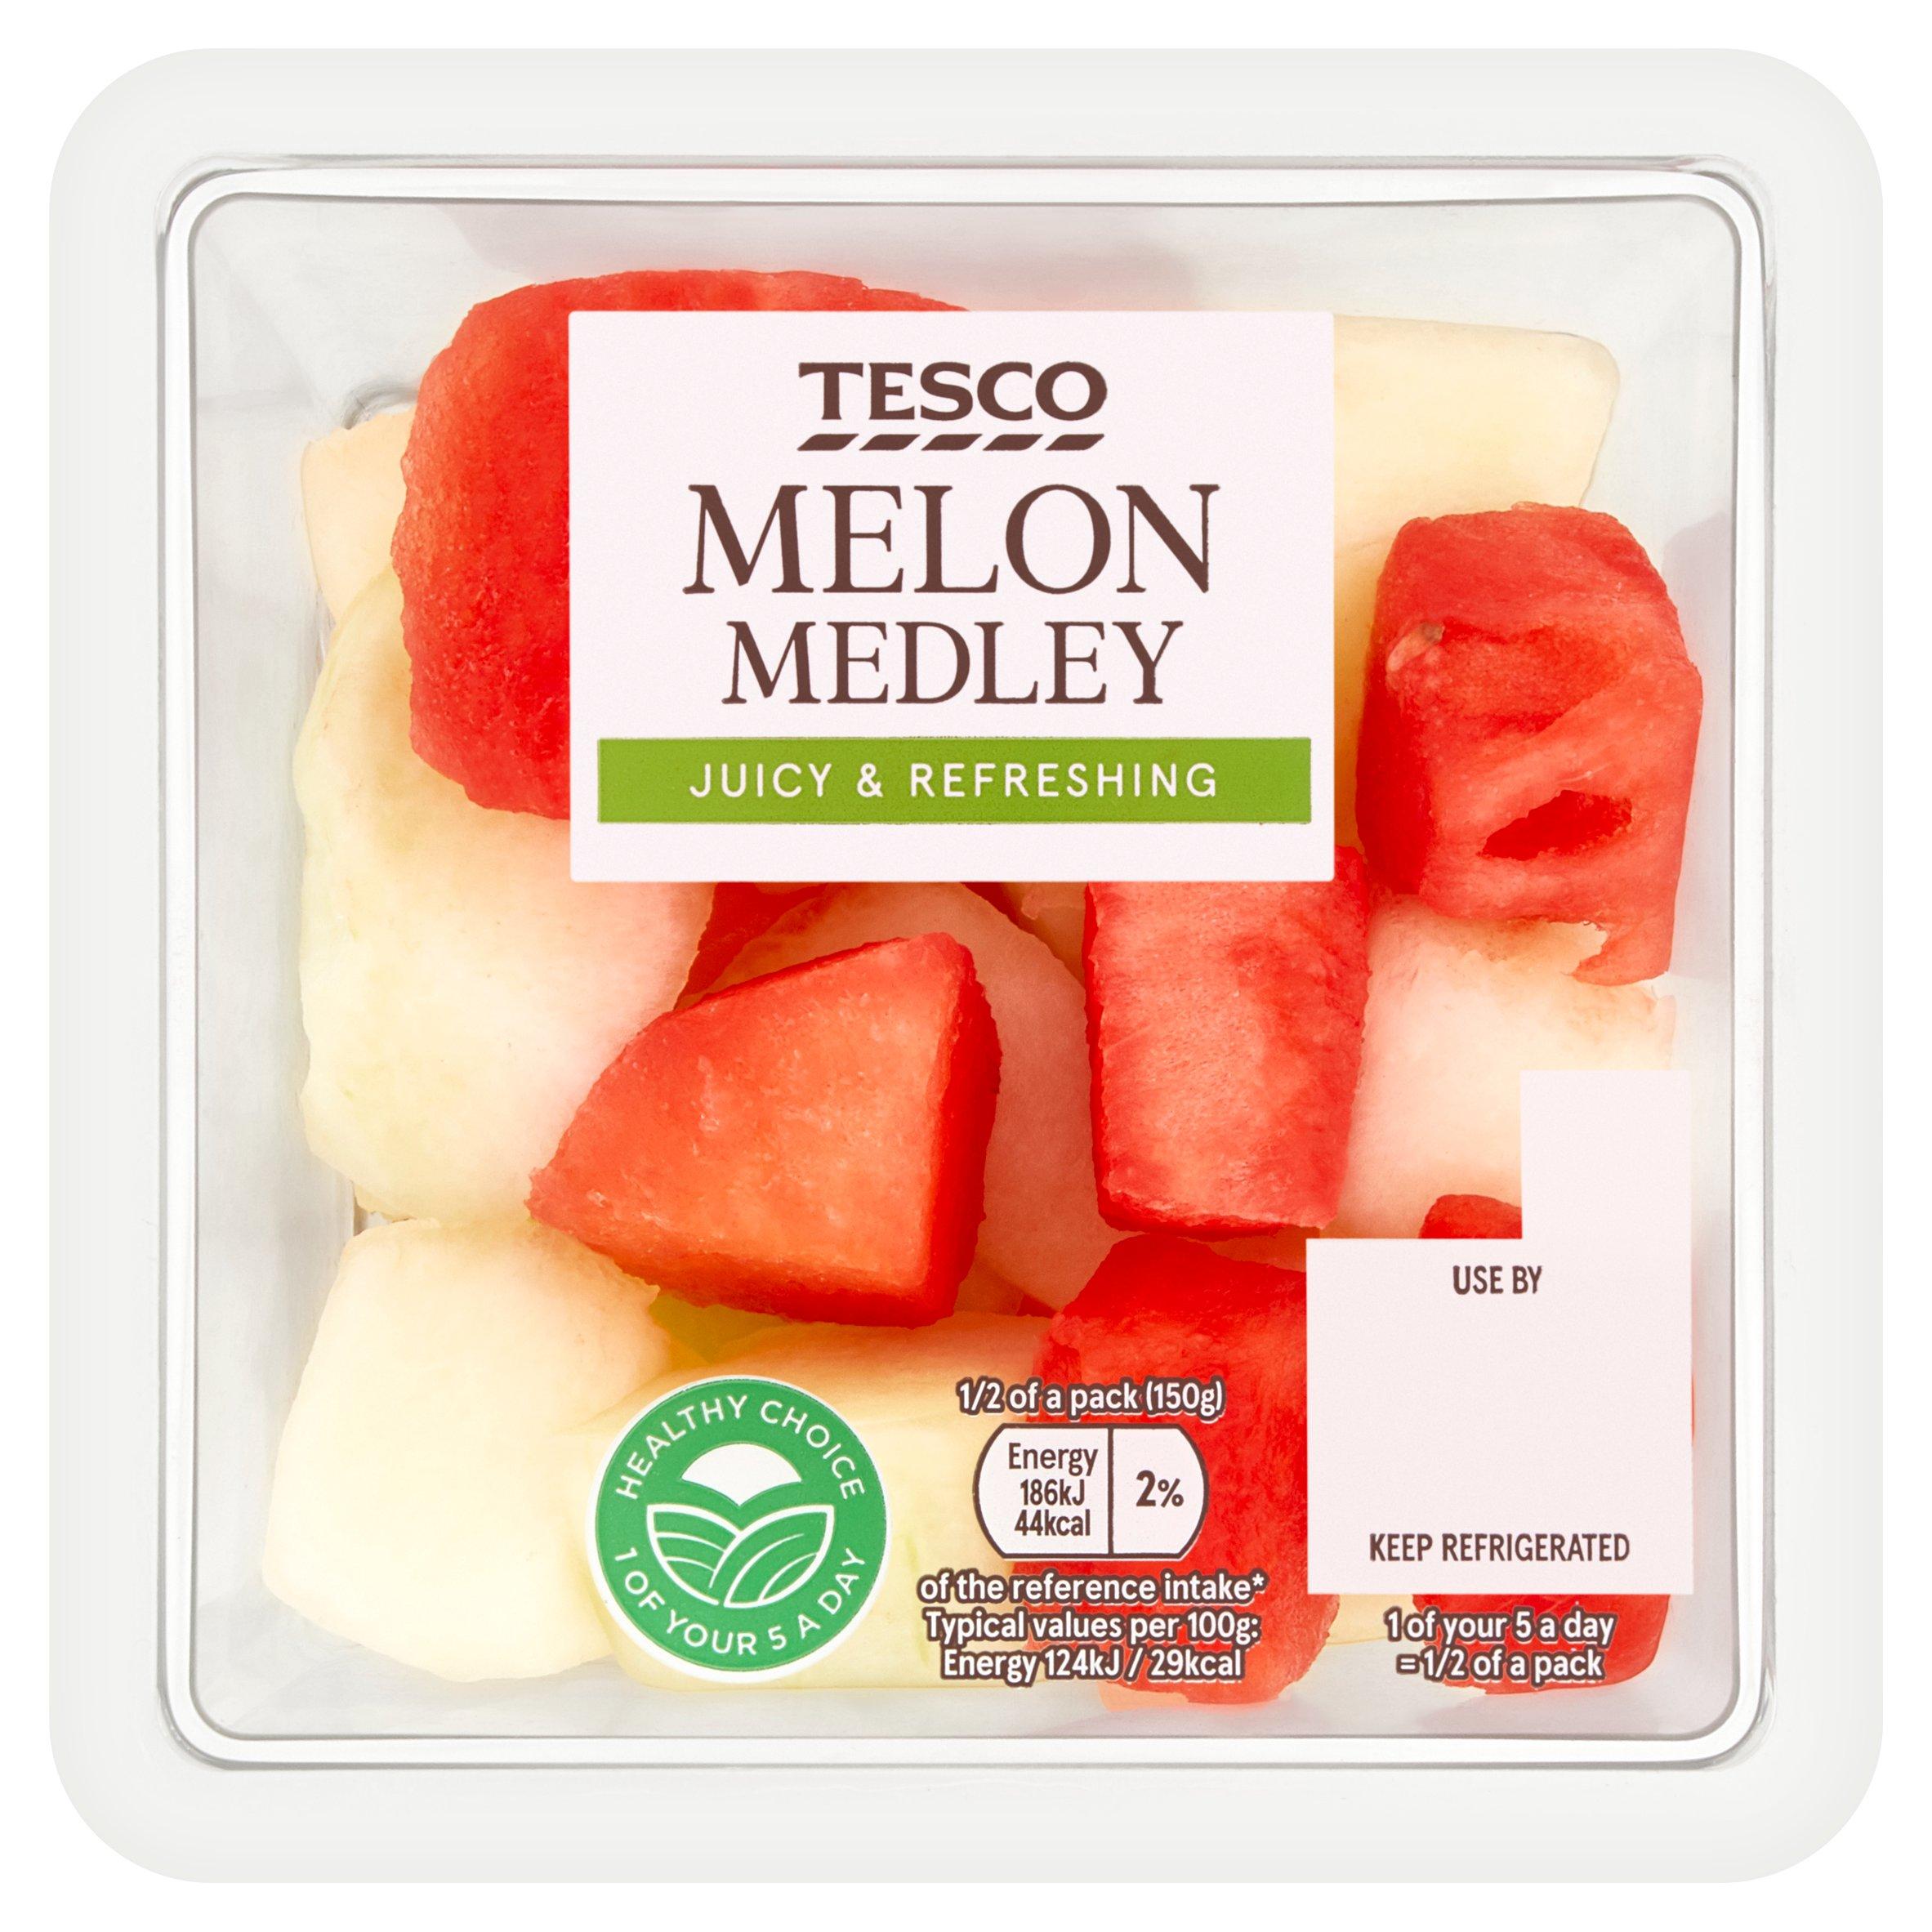 Tesco Melon Medley 300G